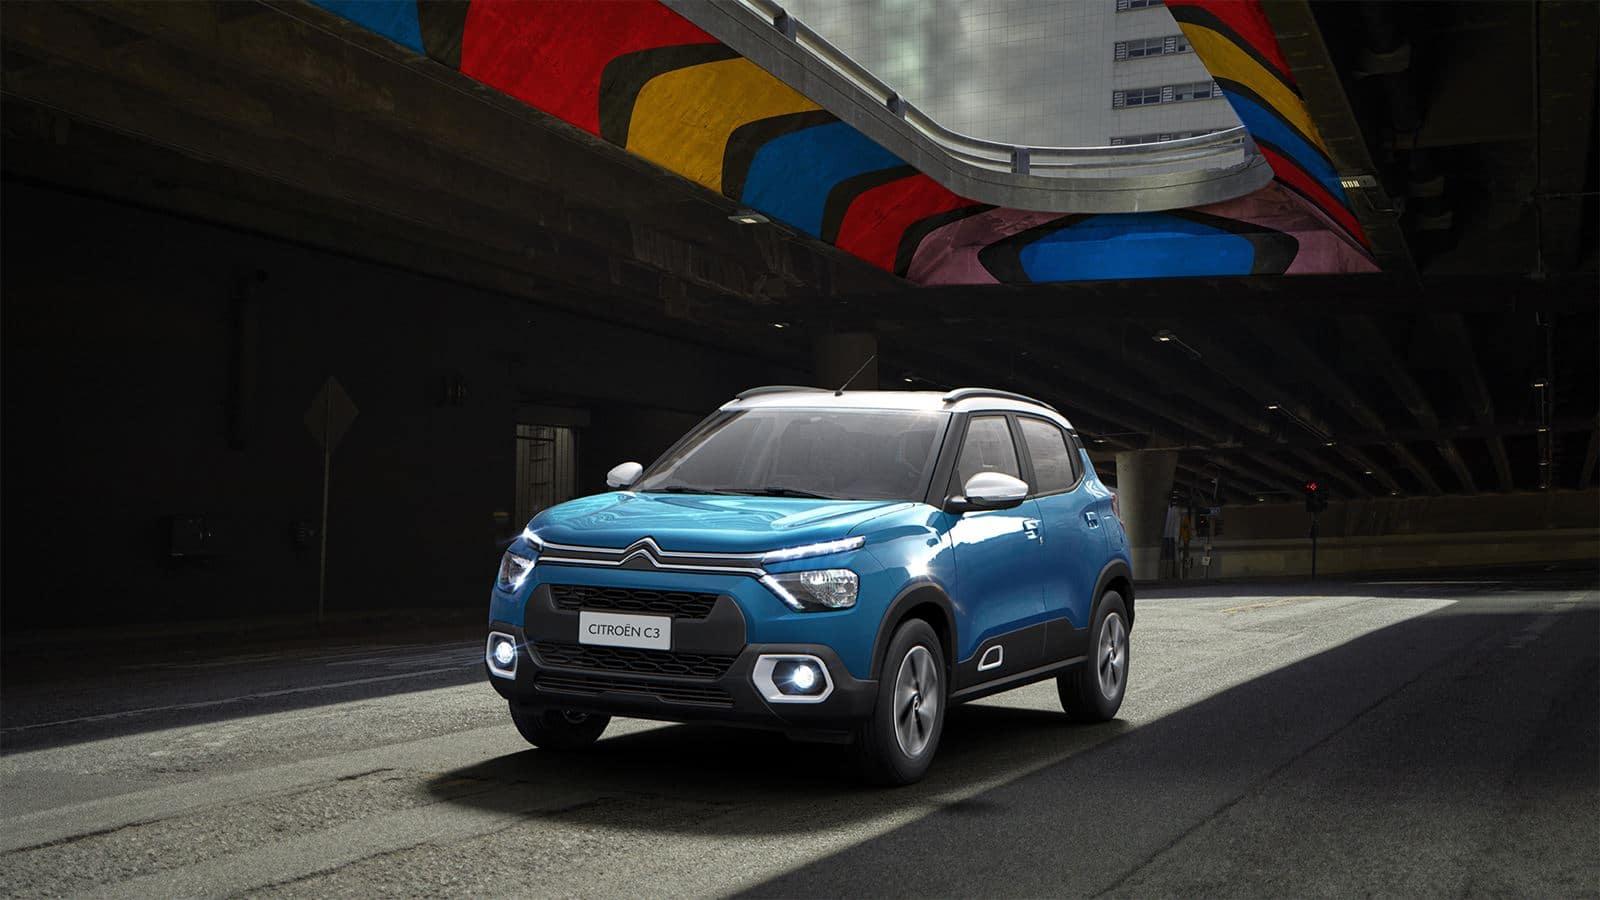 Citroën C3 azul